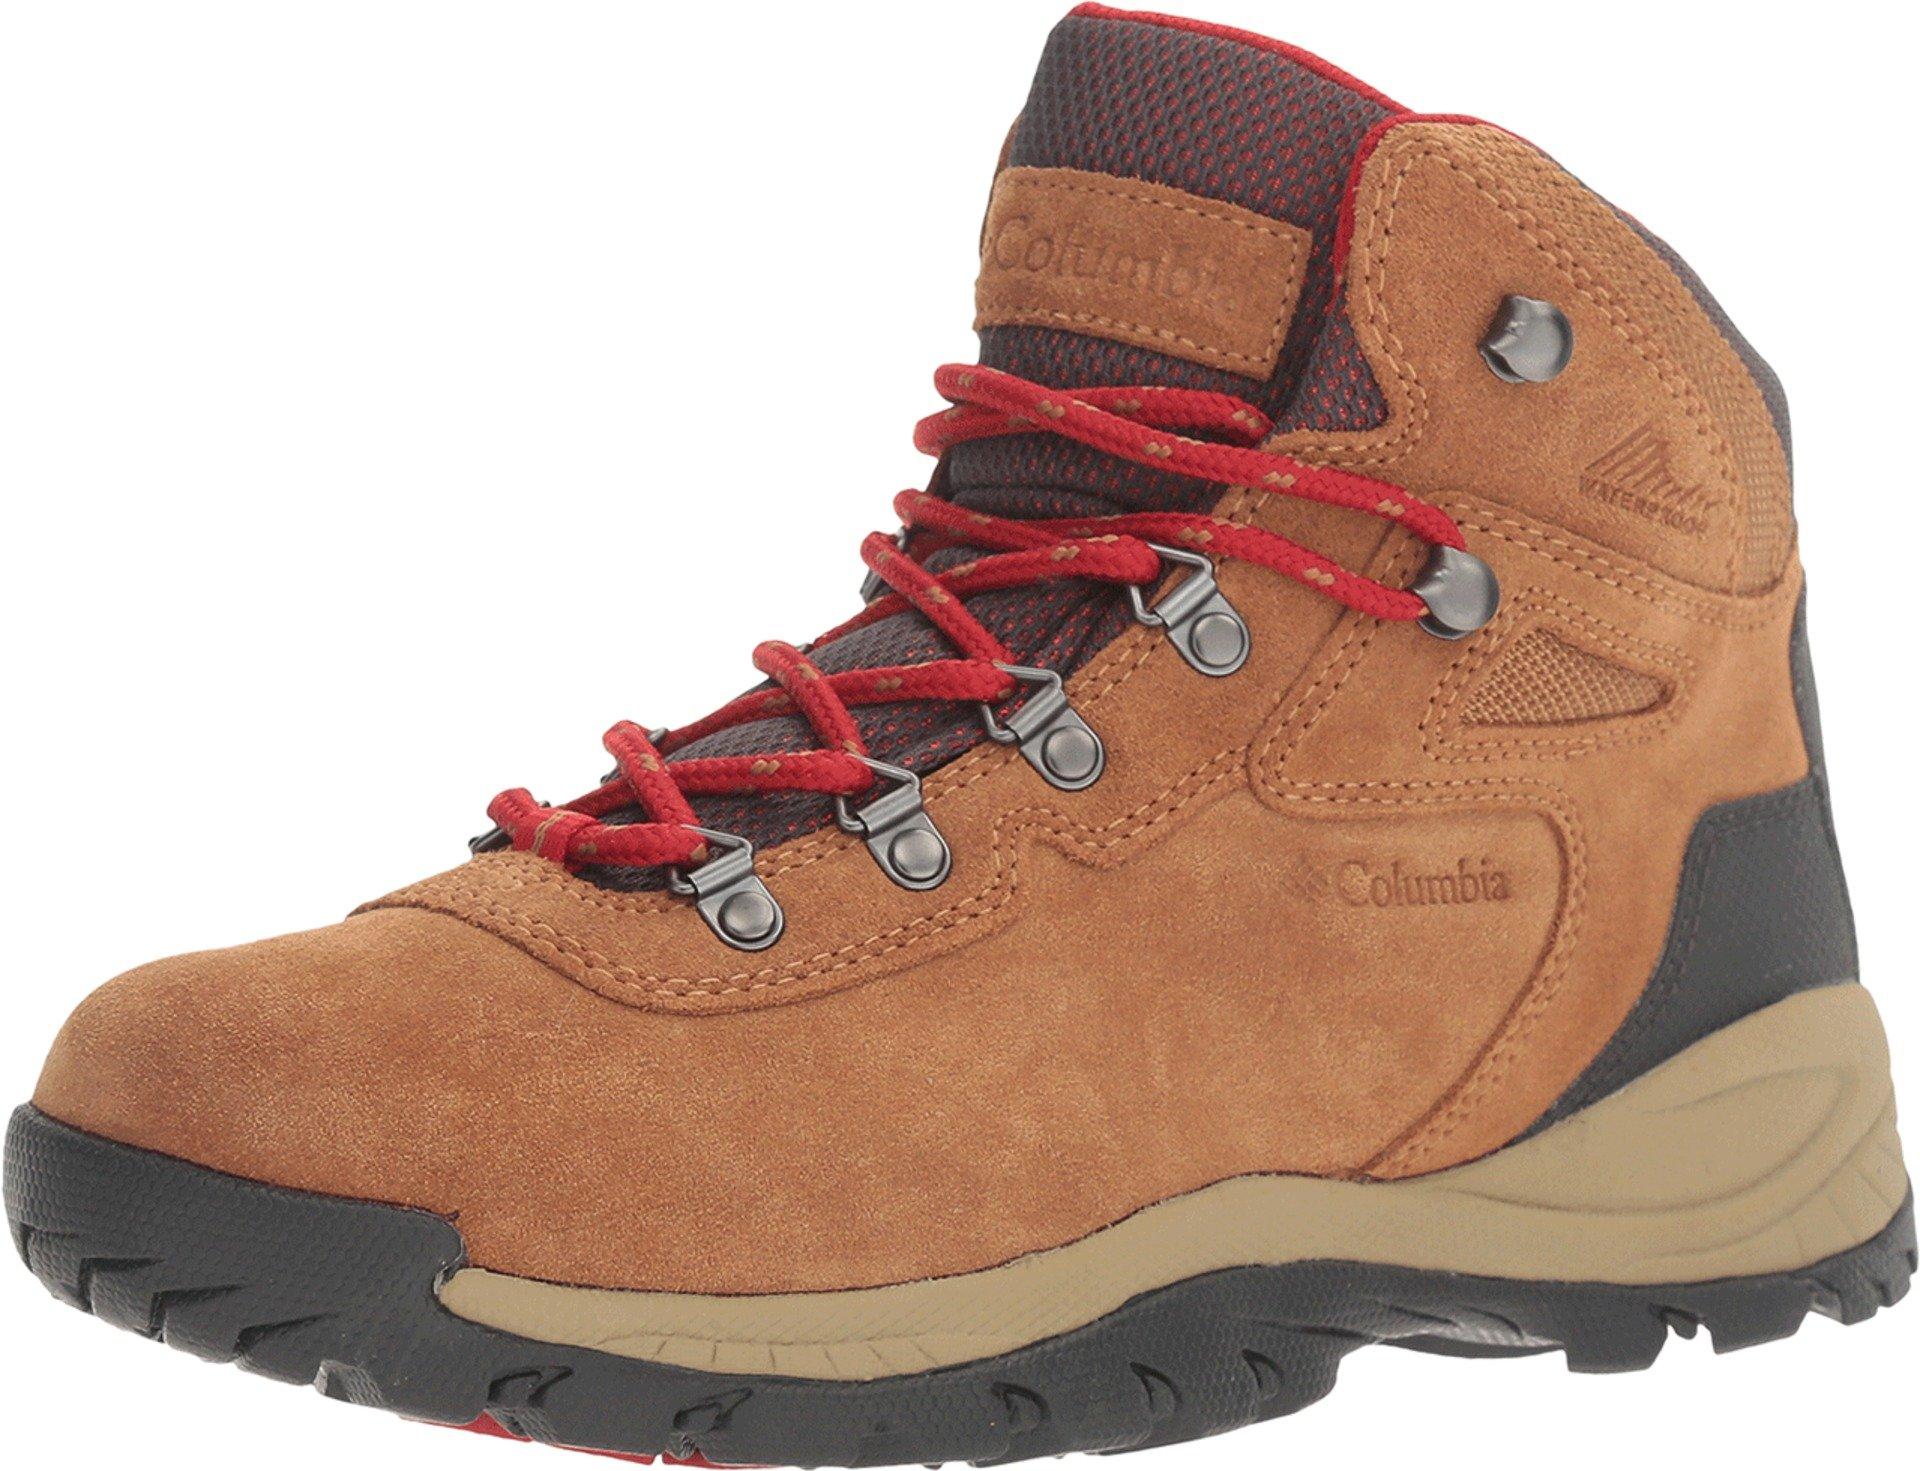 Columbia Women's Newton Ridge Plus Waterproof Amped Hiking Boot, Elk, Mountain Red, 5 Wide US by Columbia